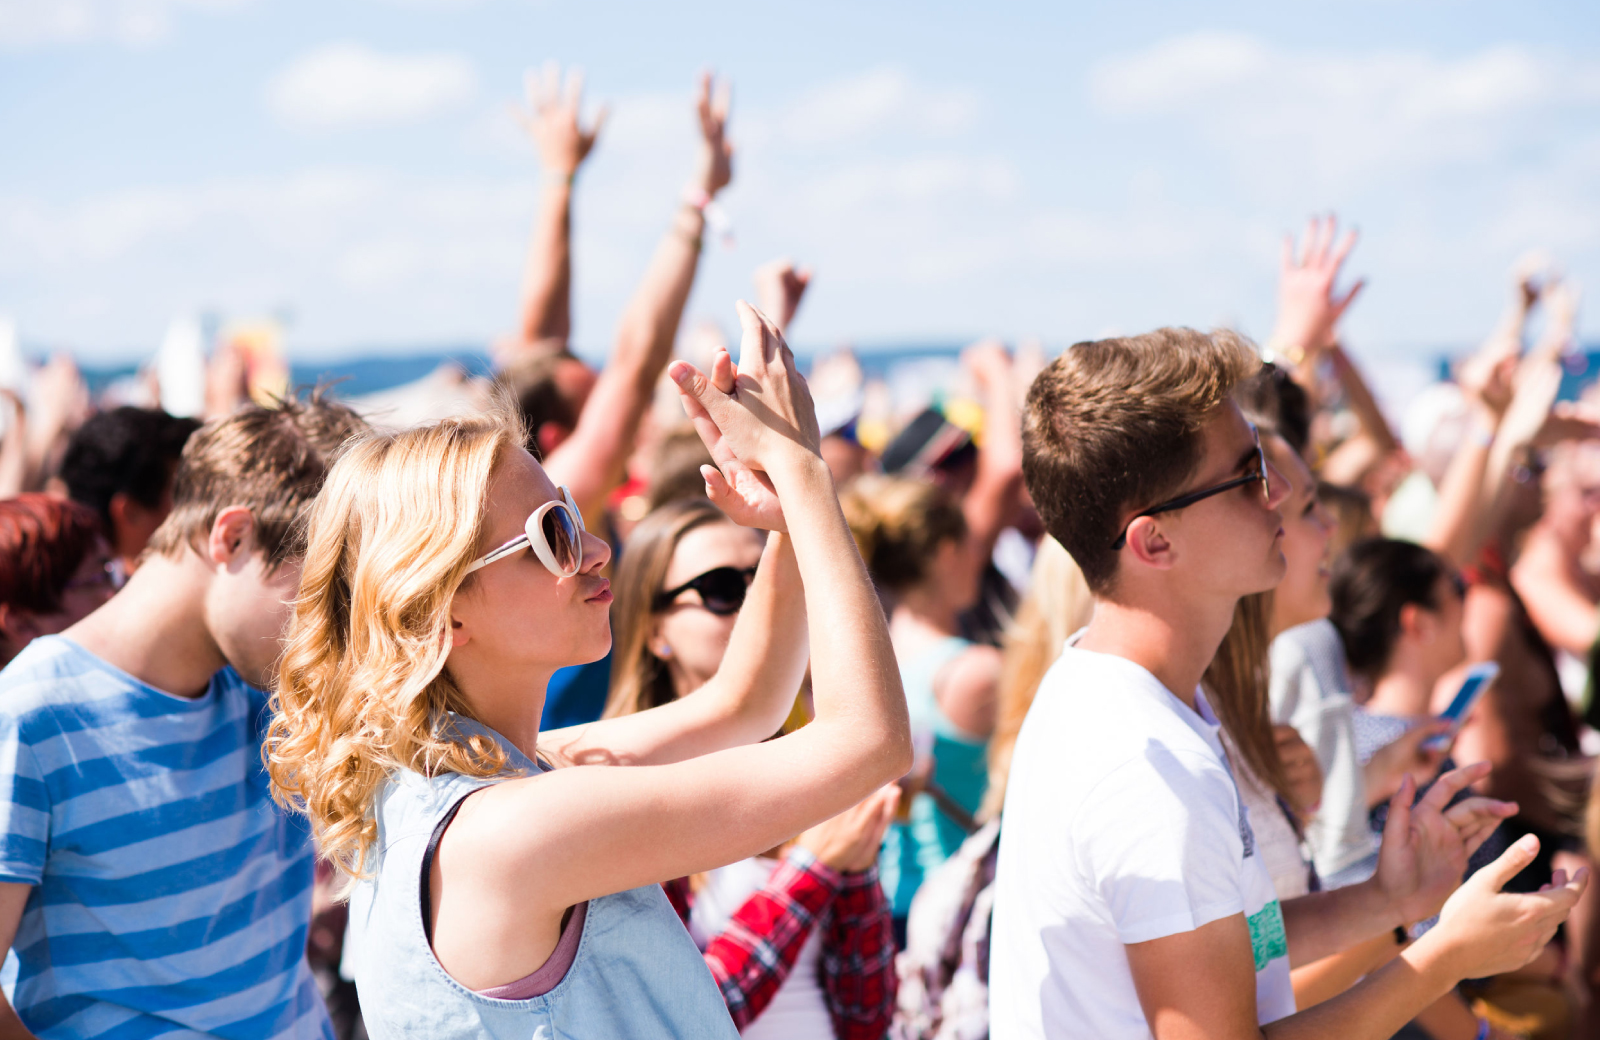 Stamford Summer Concerts - The Waypointe Apts